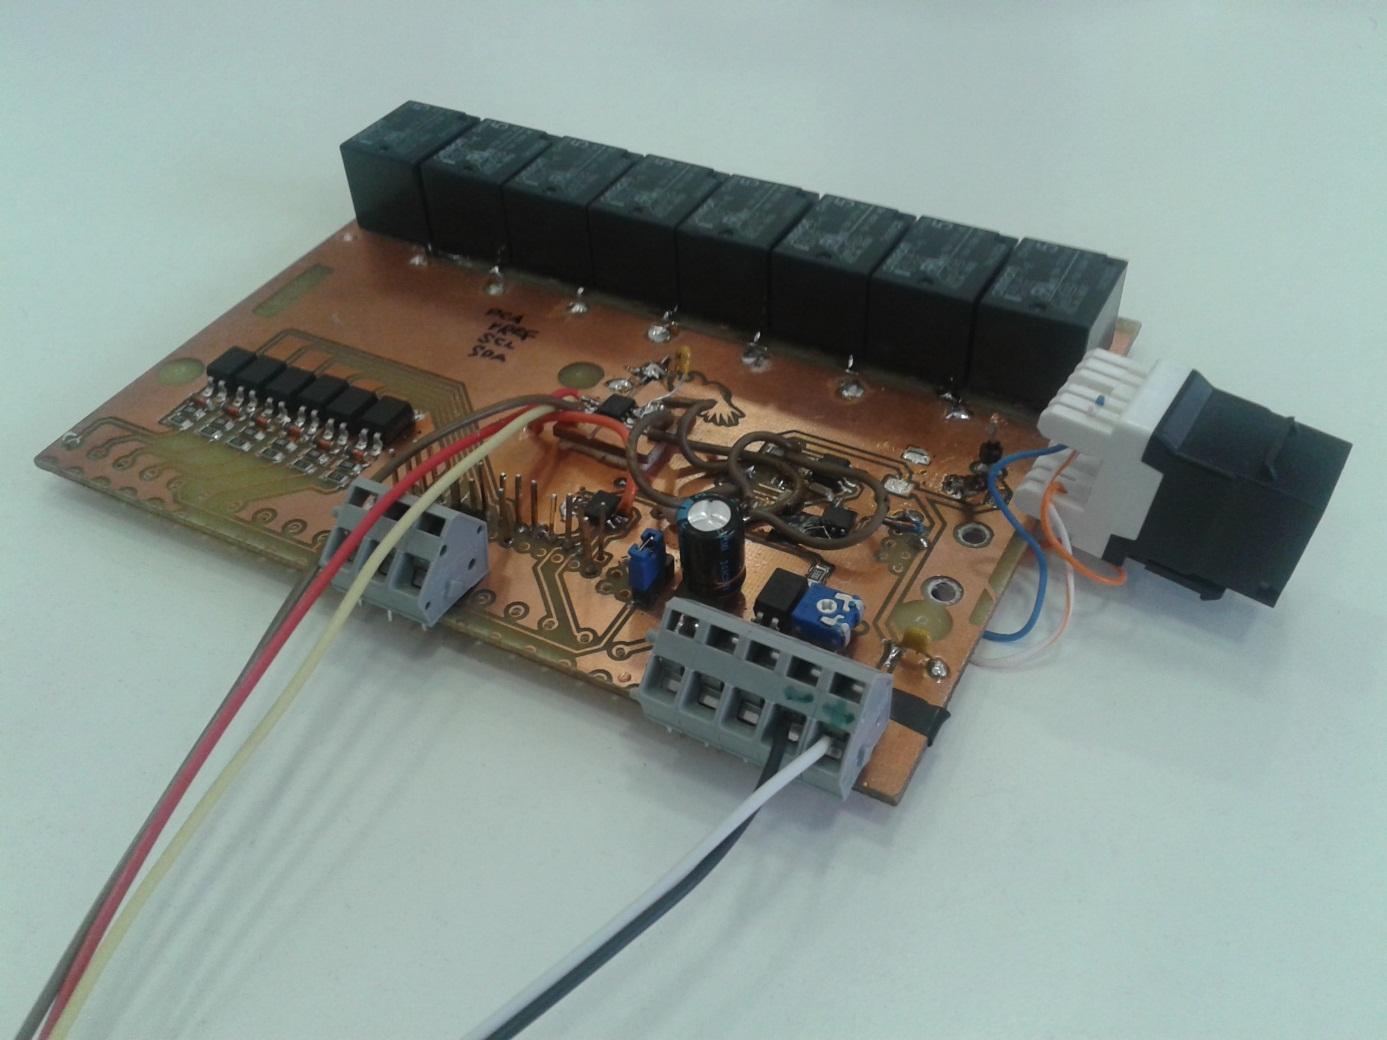 UniPi - the universal Raspberry Pi add-on board | Indiegogo